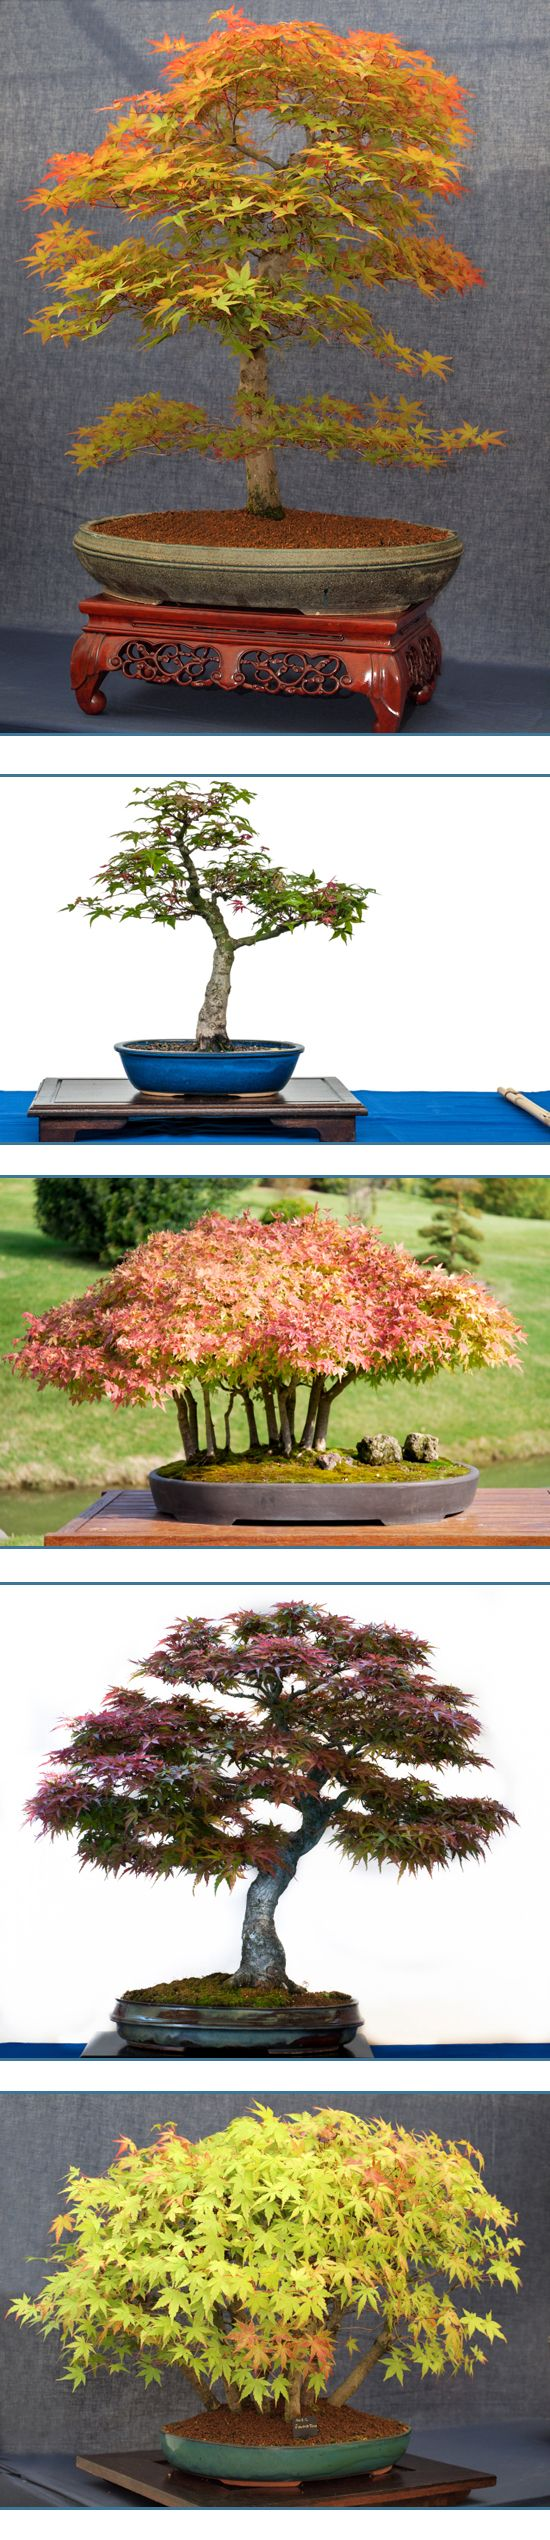 arce japones bonsai Arce japonés bonsái, la belleza en miniatura